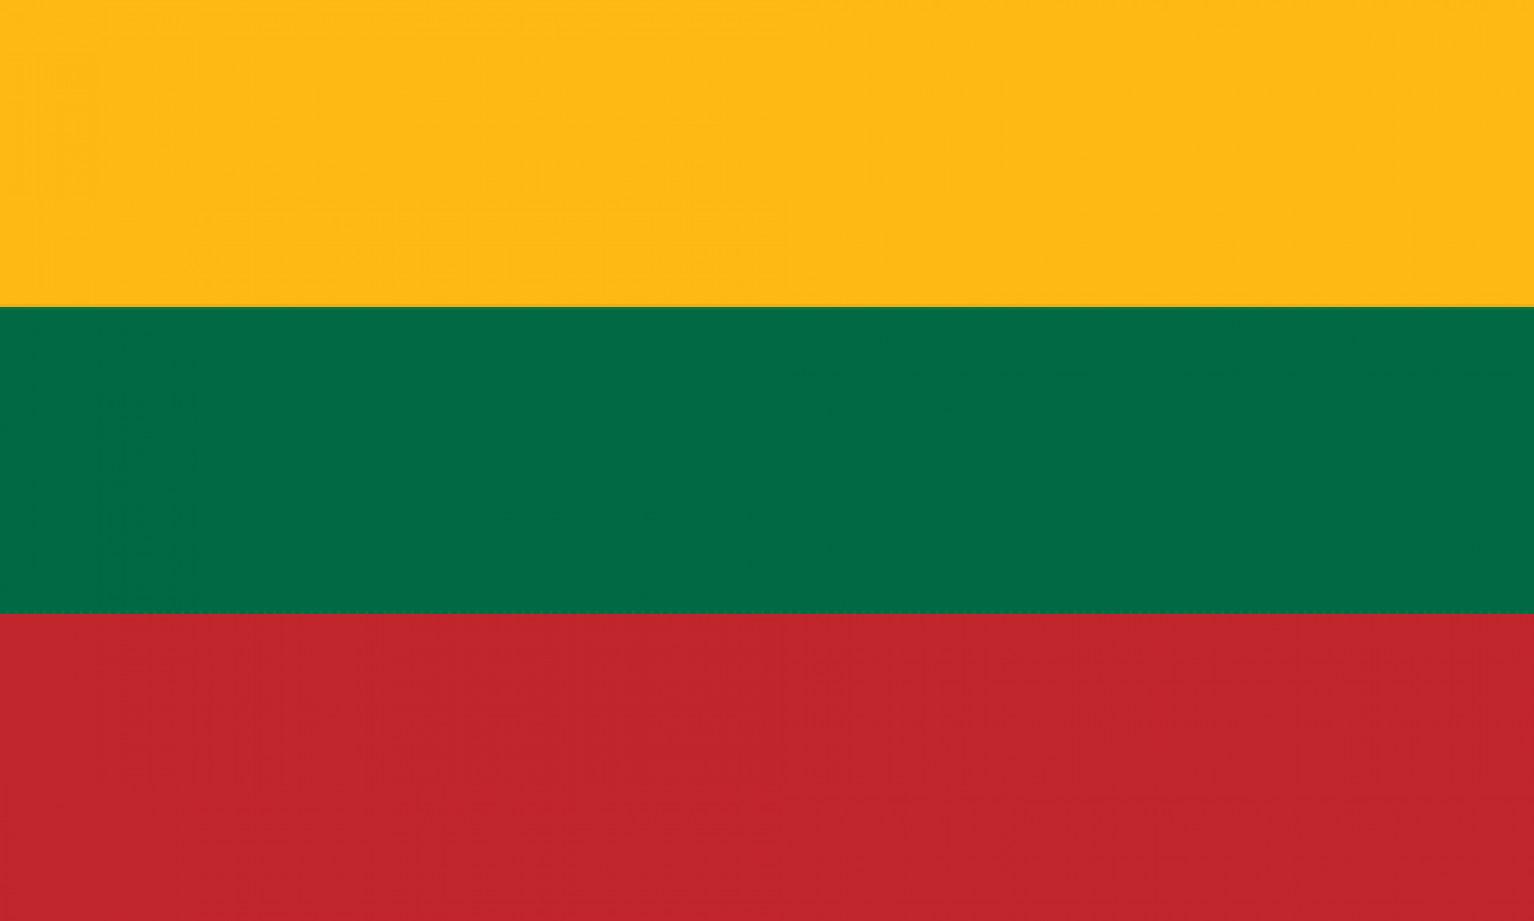 Lithuania Peer-to-Peer Lending platforms and market